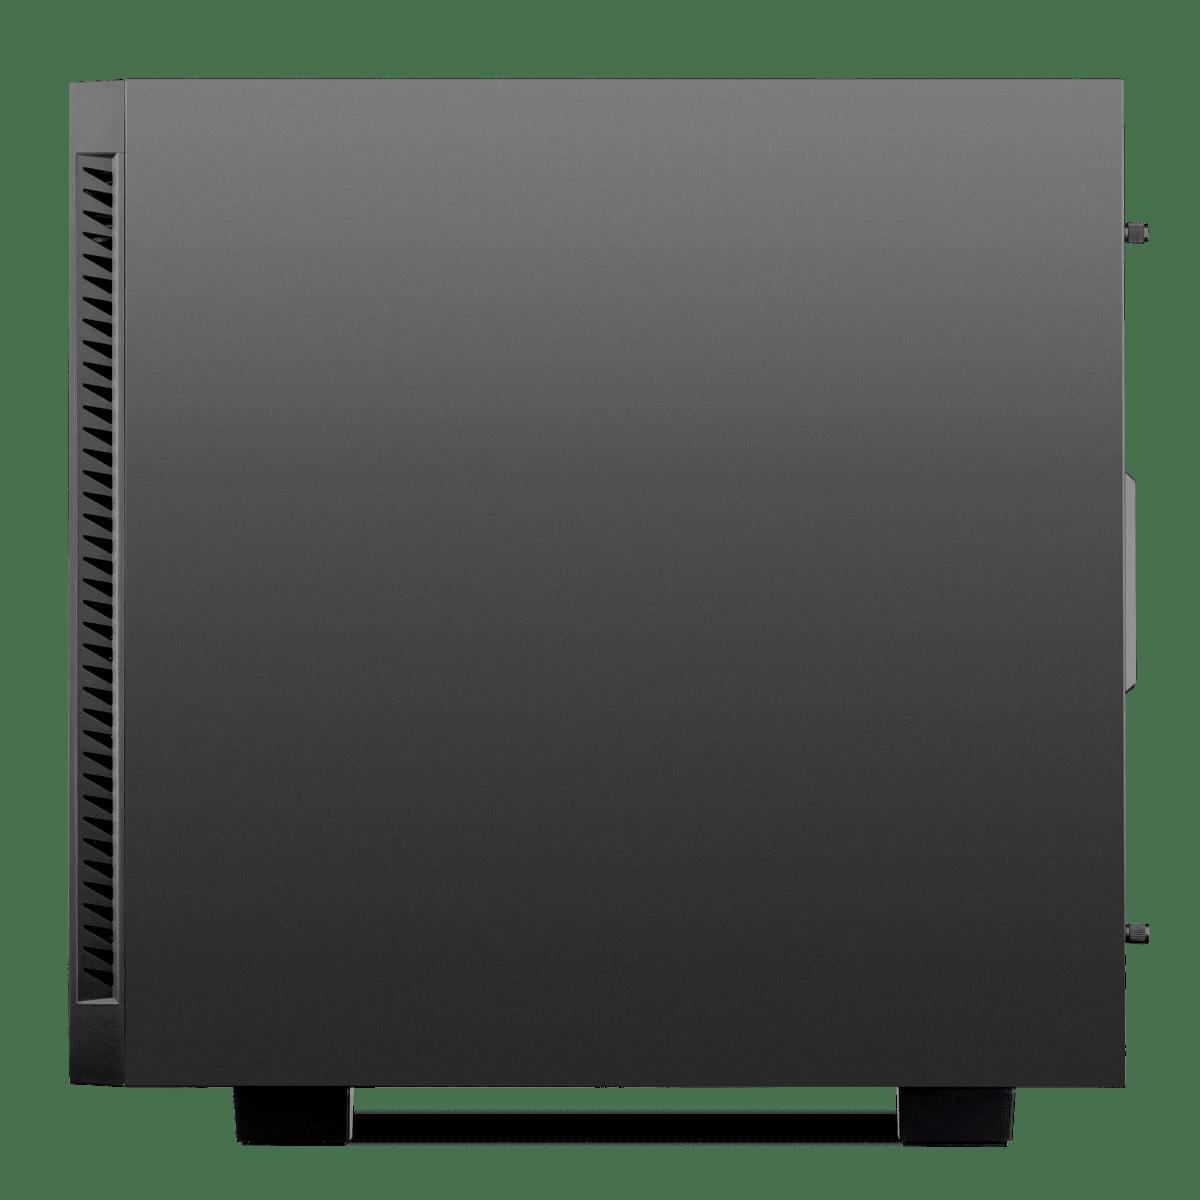 98d04c7ae3c AMD Ryzen 7 1700 Gaming PCs: iBUYPOWER®